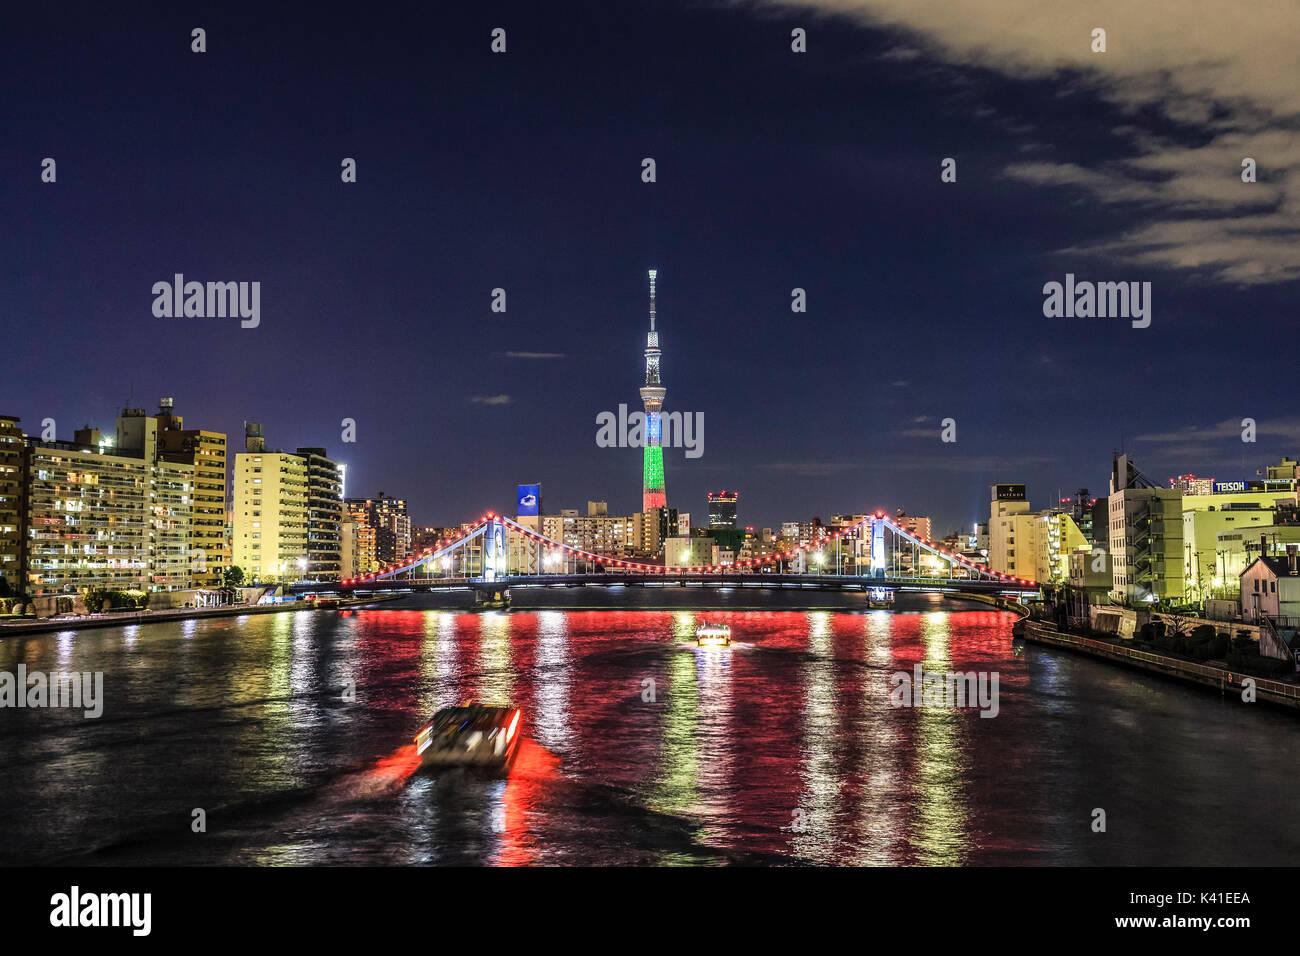 Illuminated Tokyo Skytree Tower in Tokyo,Japan - Stock Image